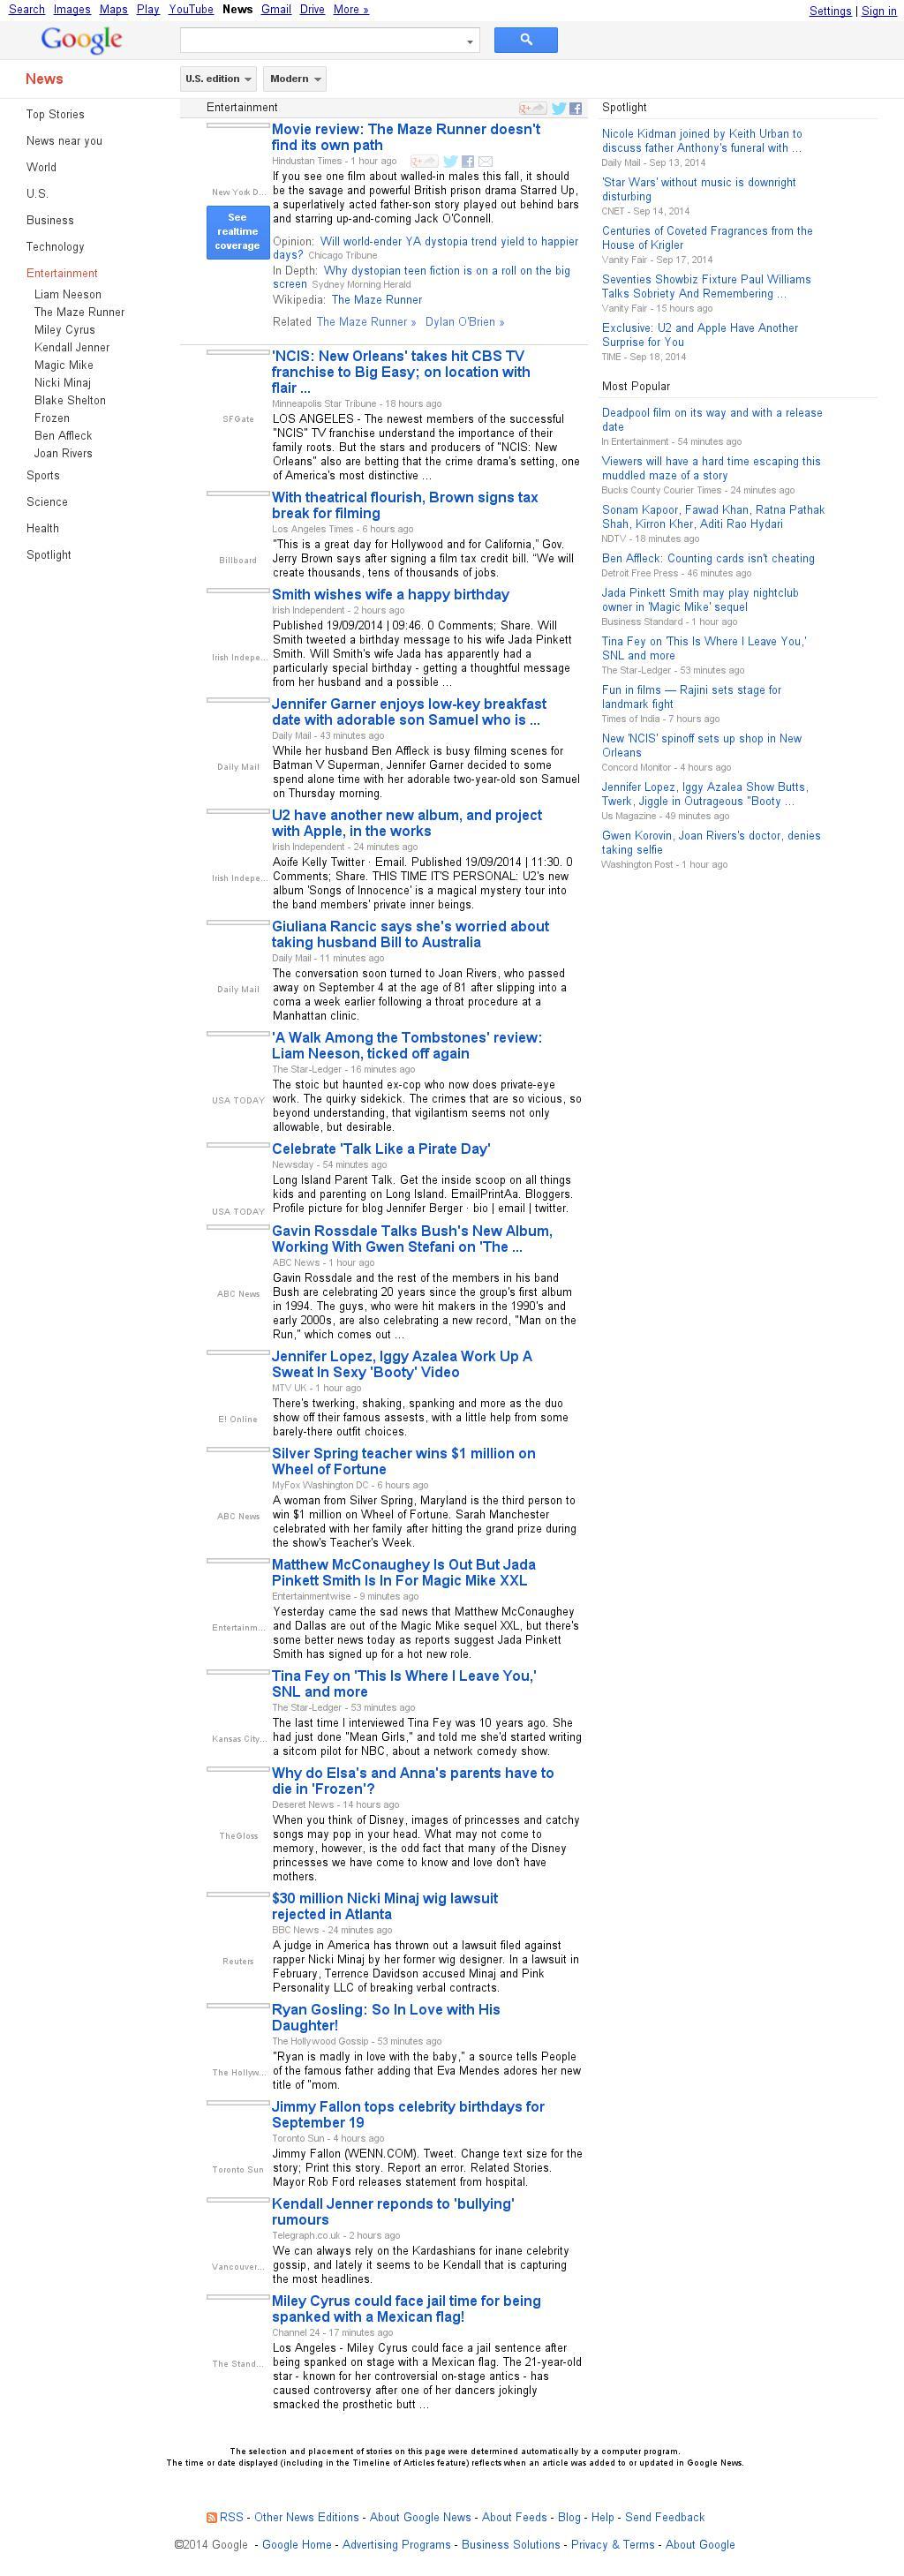 Google News: Entertainment at Friday Sept. 19, 2014, 11:07 a.m. UTC